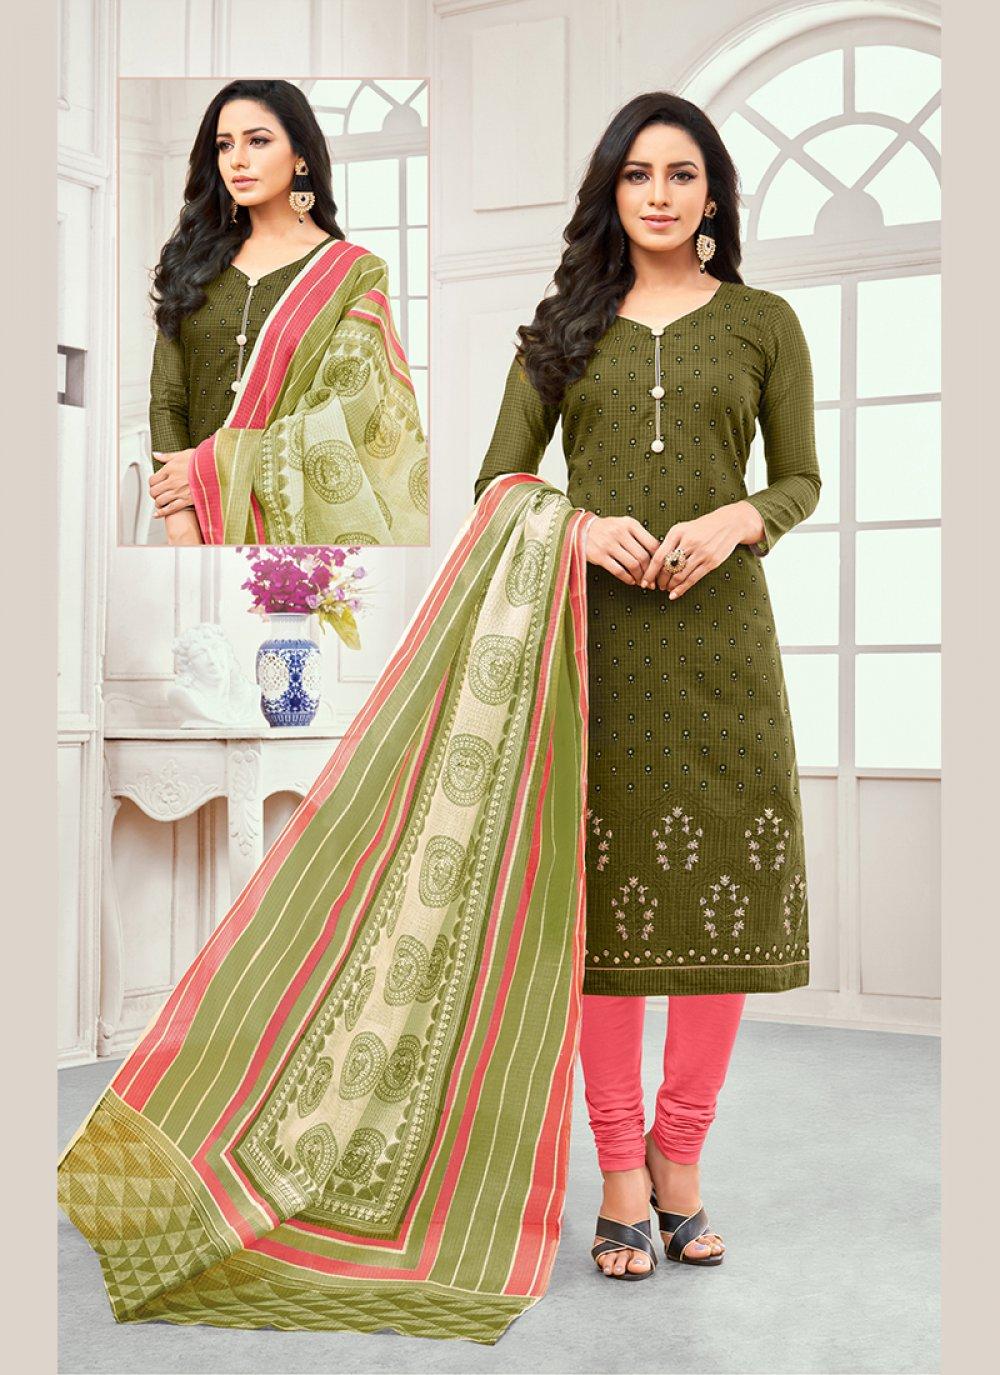 Cotton Satin Embroidered Green Designer Salwar Kameez